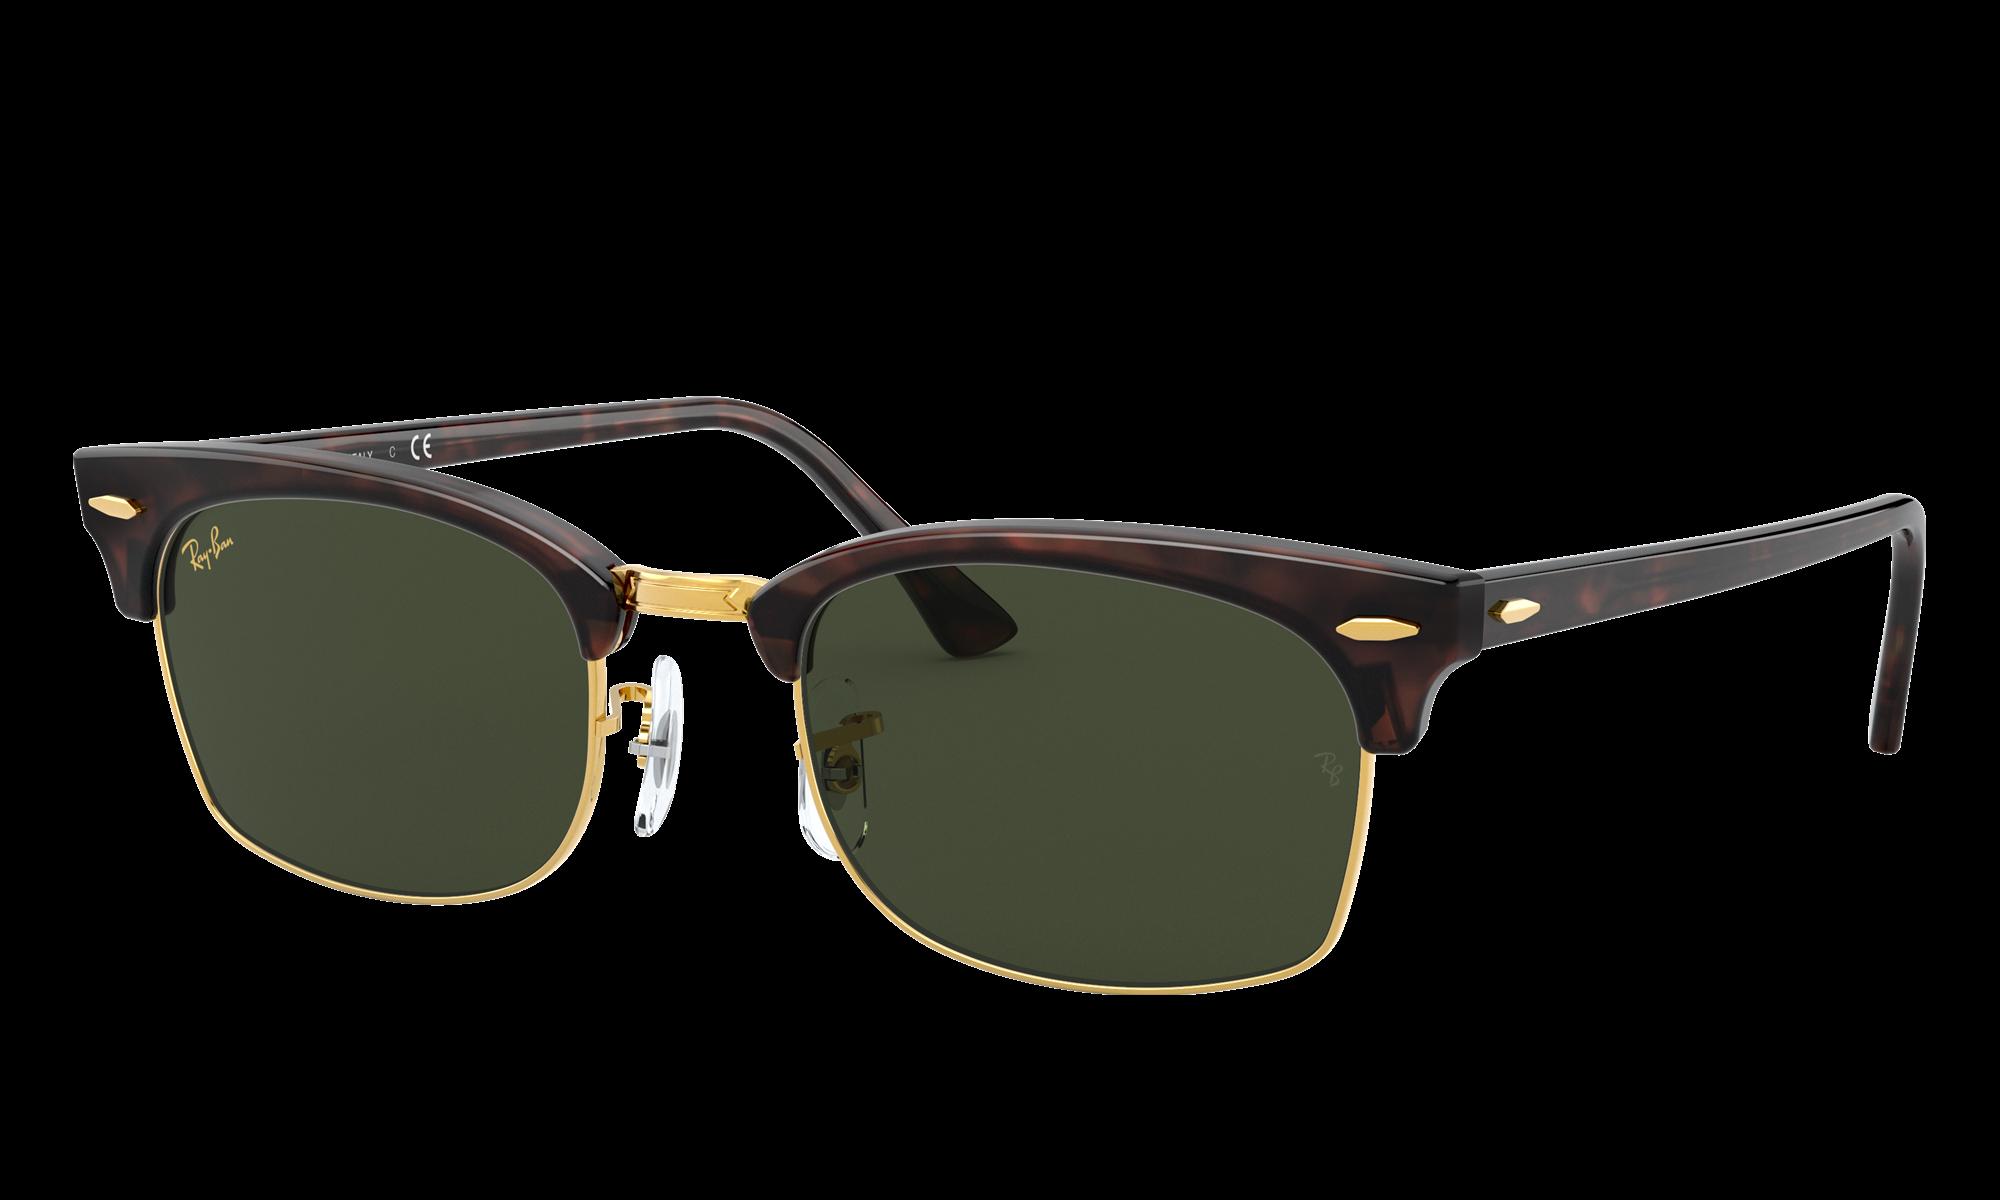 Retro Sunglasses | Vintage Glasses | New Vintage Eyeglasses Ray-Ban Unisex Clubmaster Square Legend Gold Tortoise Size Standard $154.00 AT vintagedancer.com